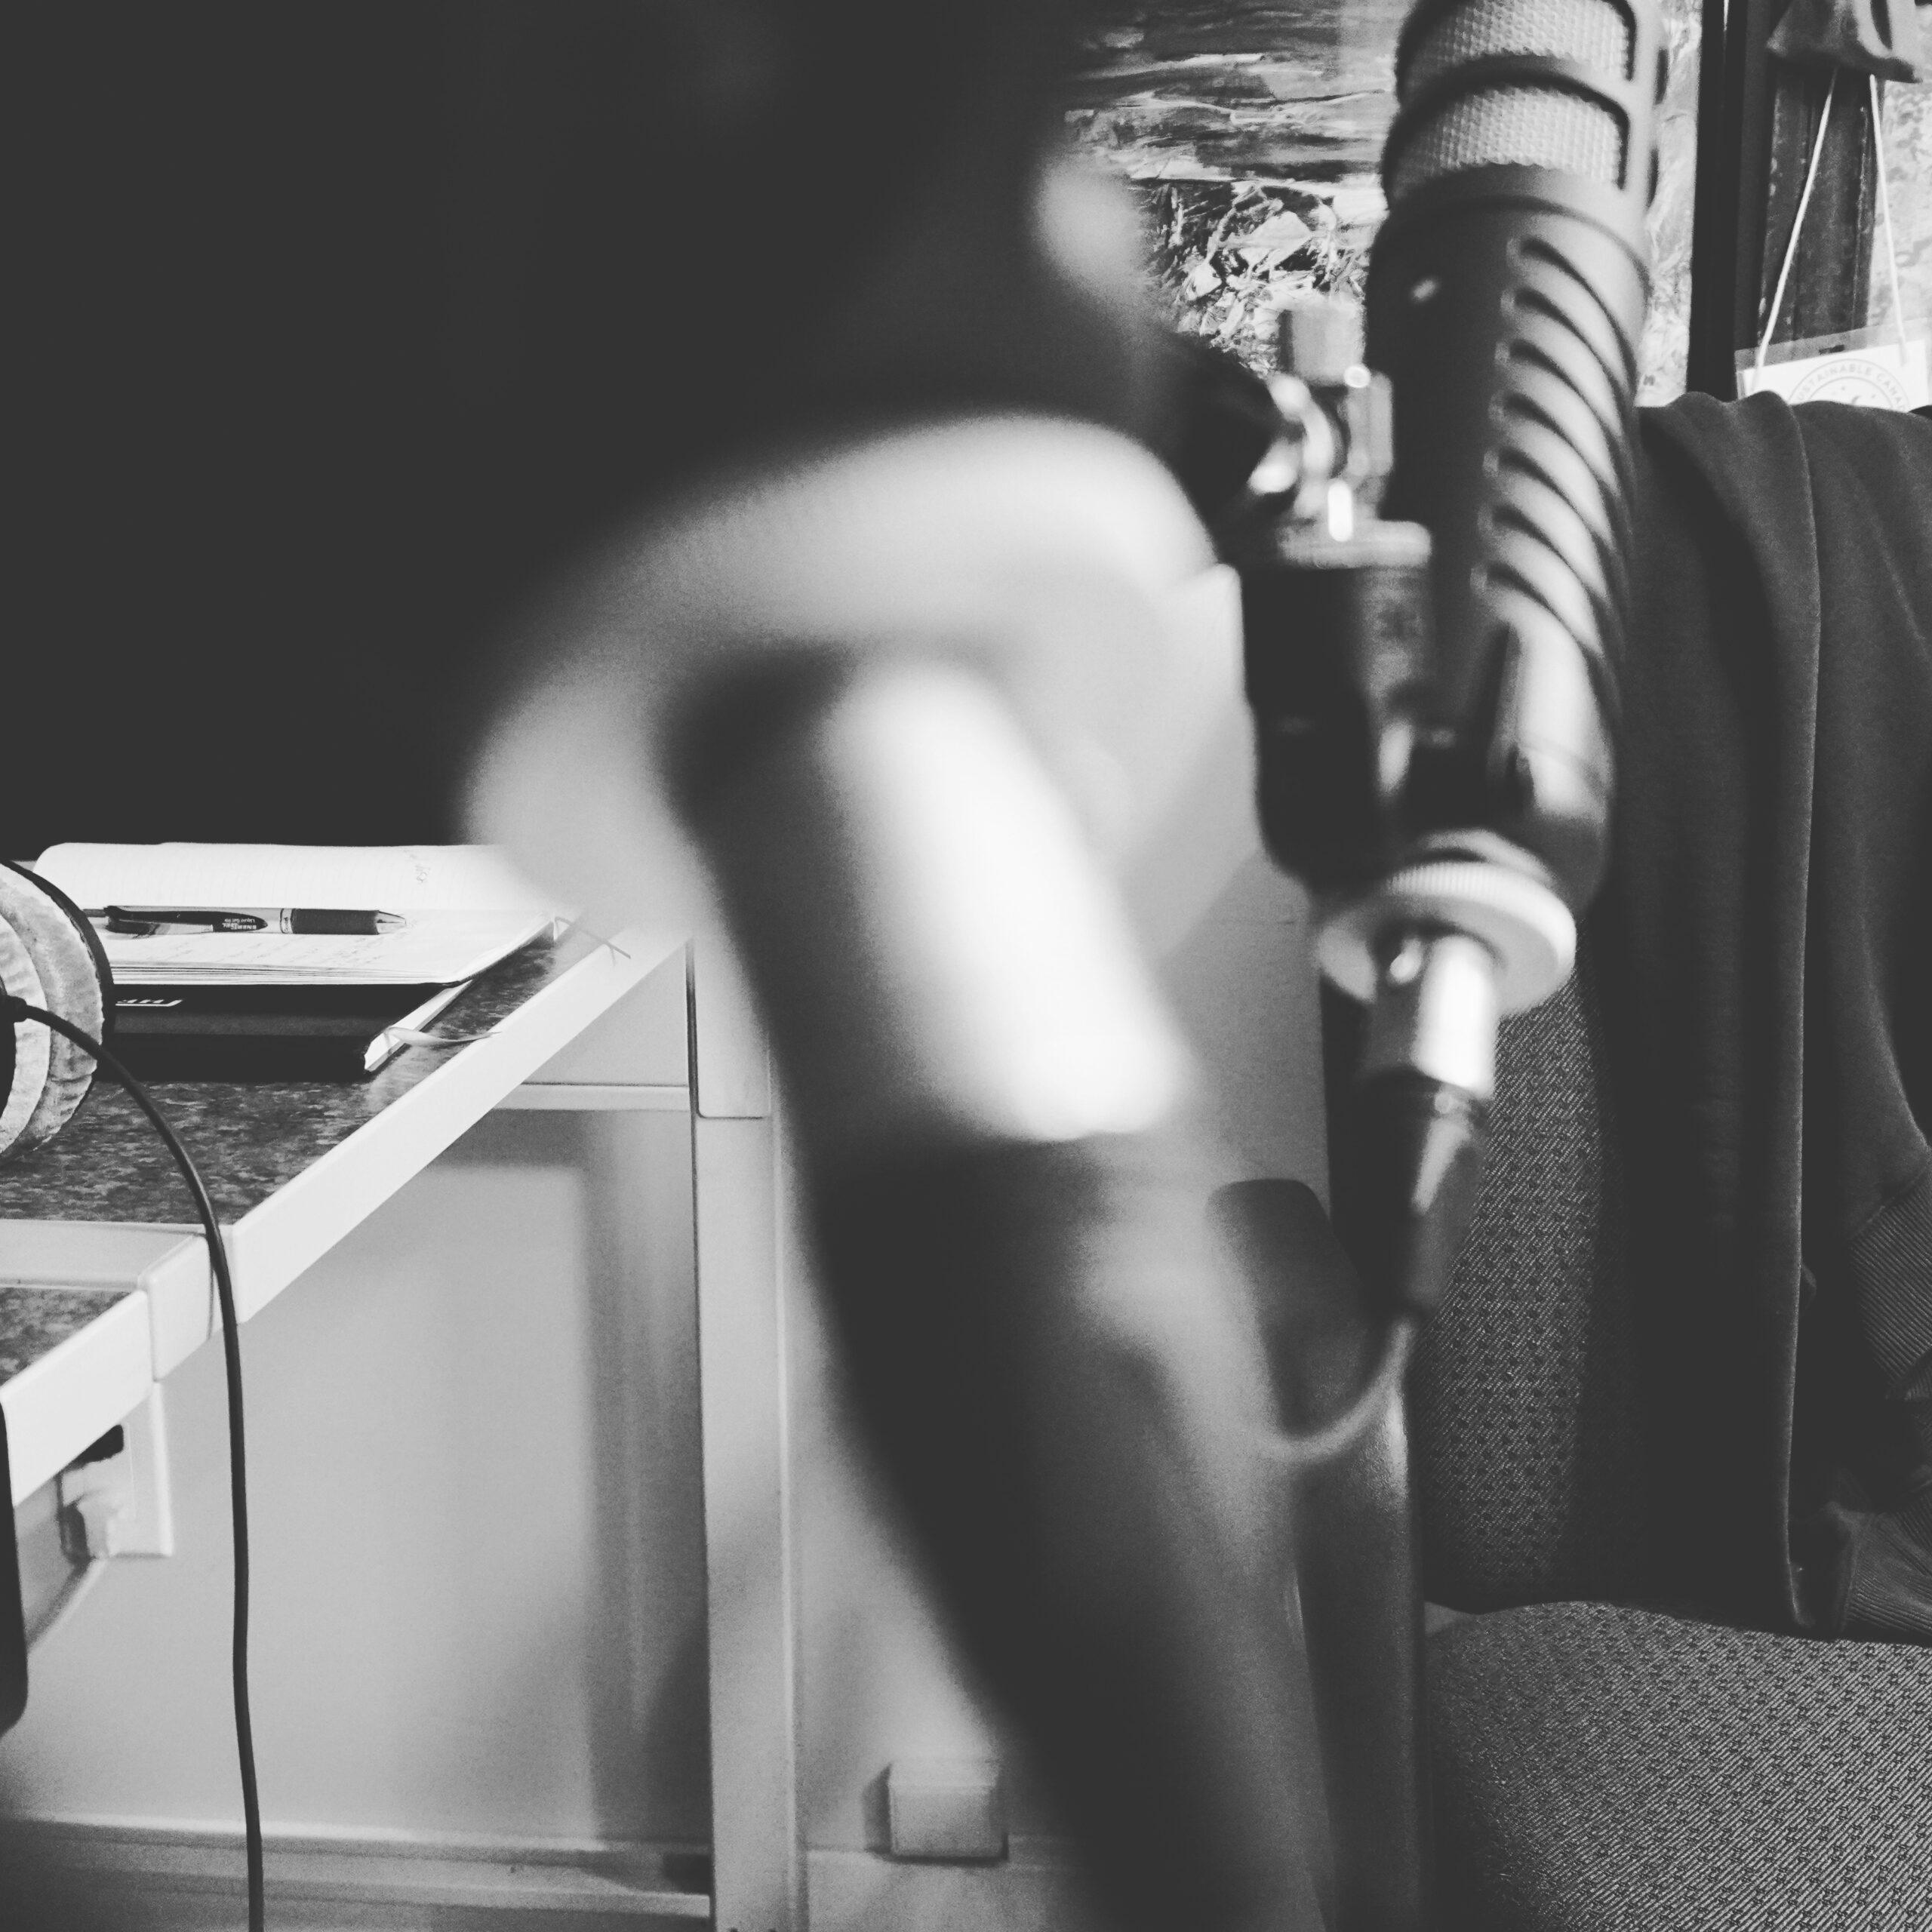 studio mood black and white setting rode microphones in audio video studio